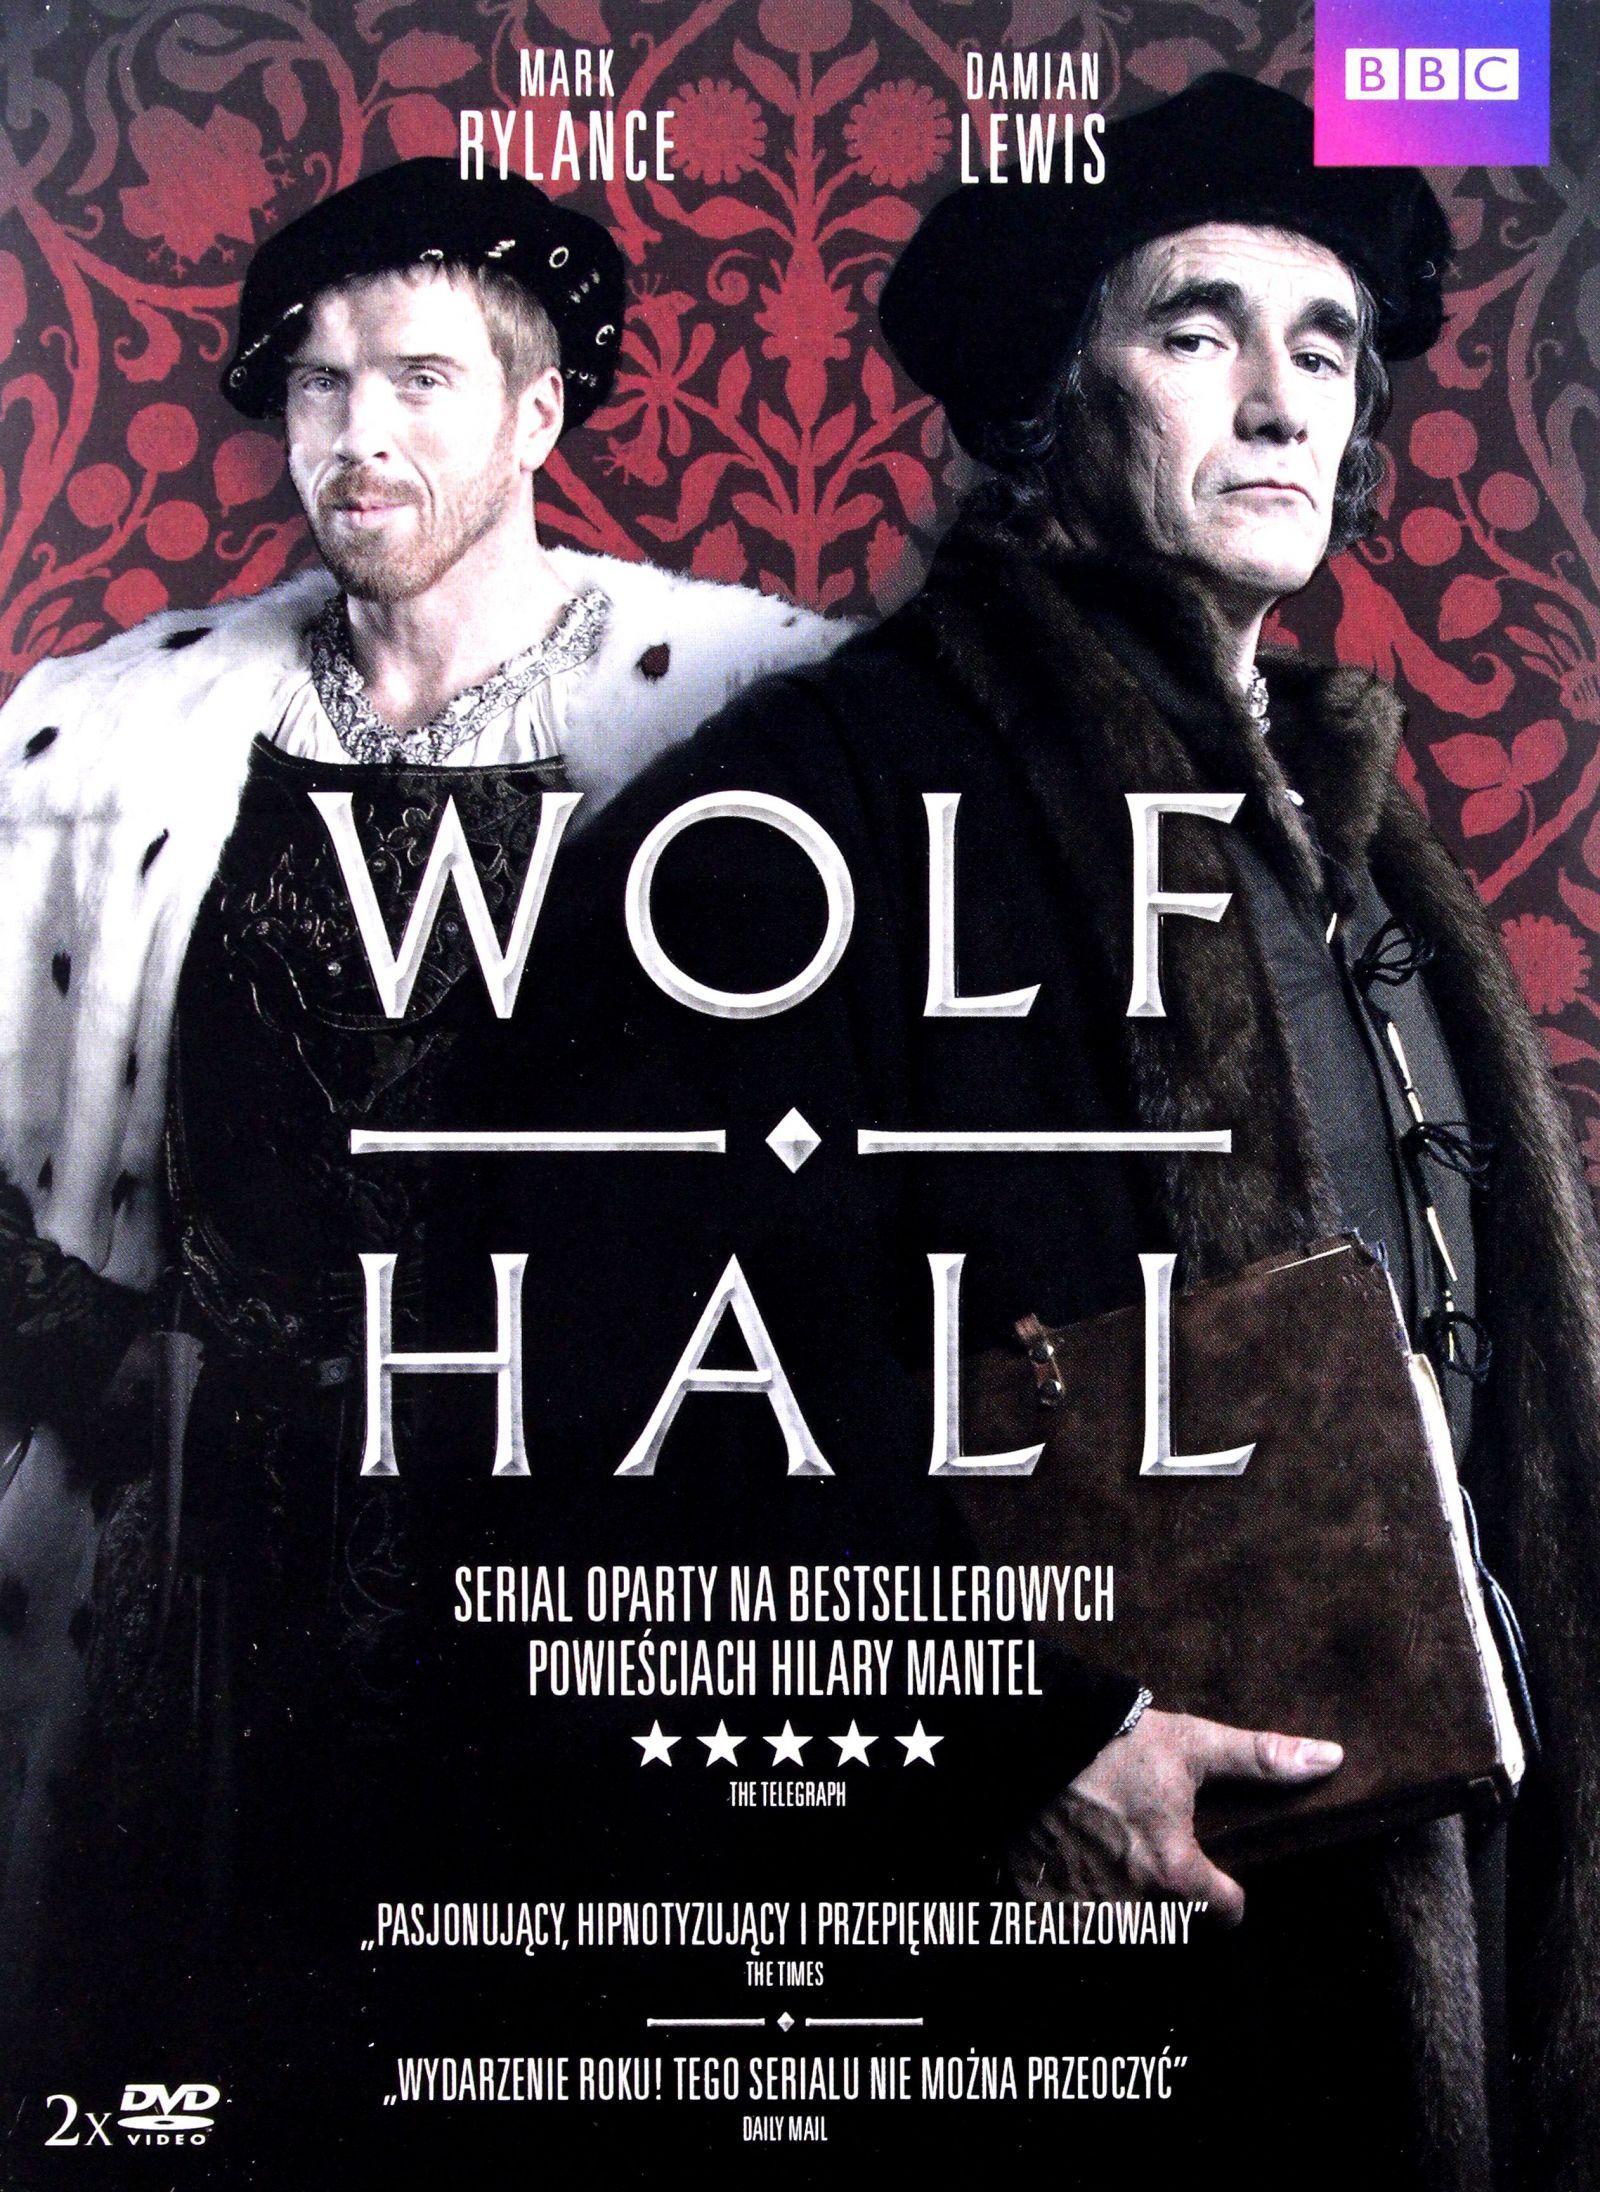 WOLF HALL SEZON 1 (BBC) [2DVD]